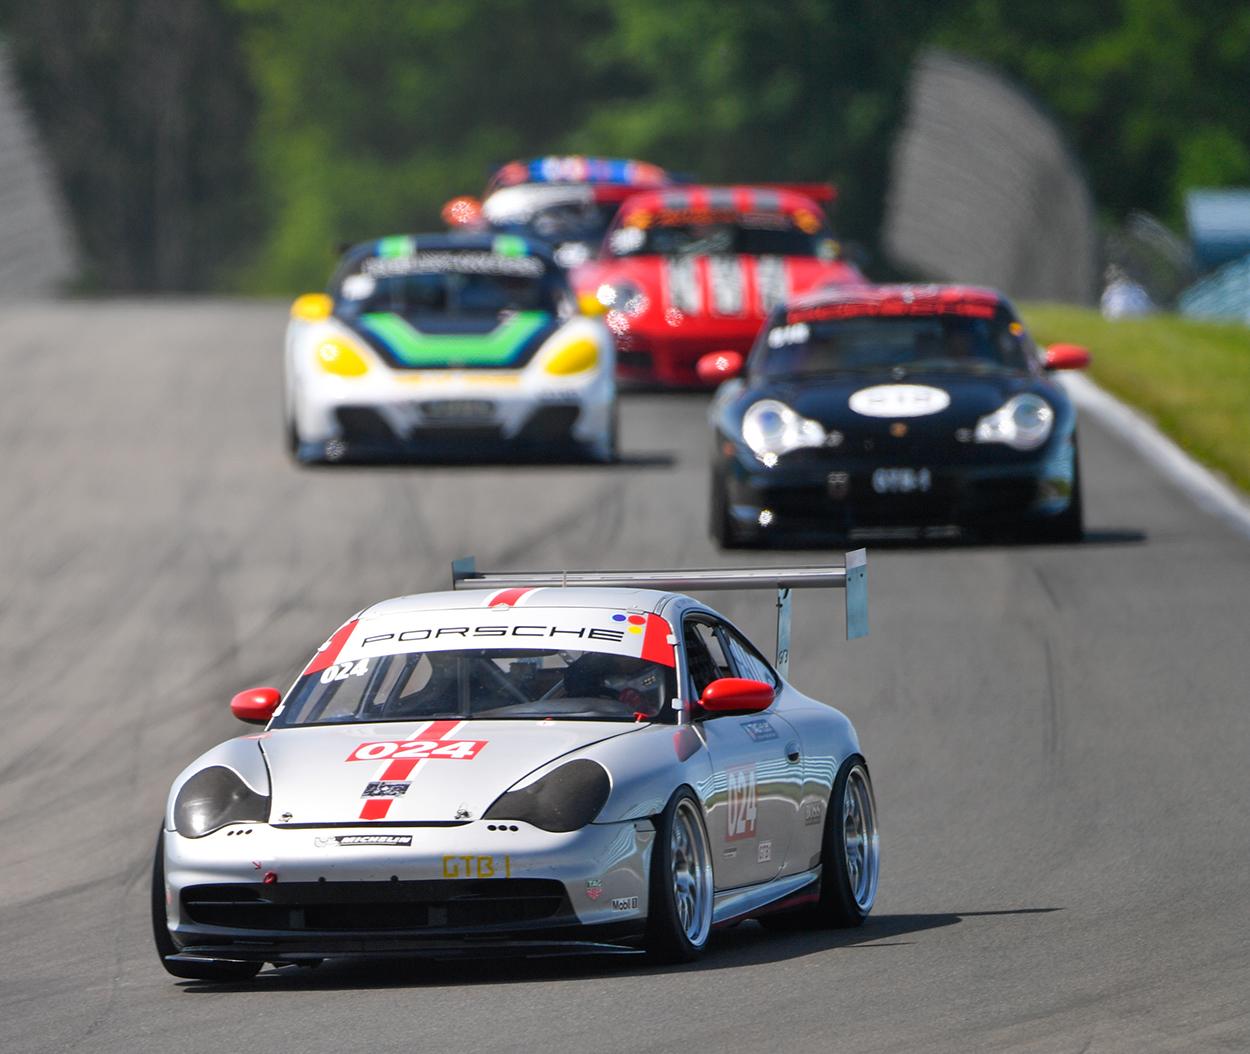 Porsche Club of America - Watkins Glen International 2021 race recap | PCA Club Racing